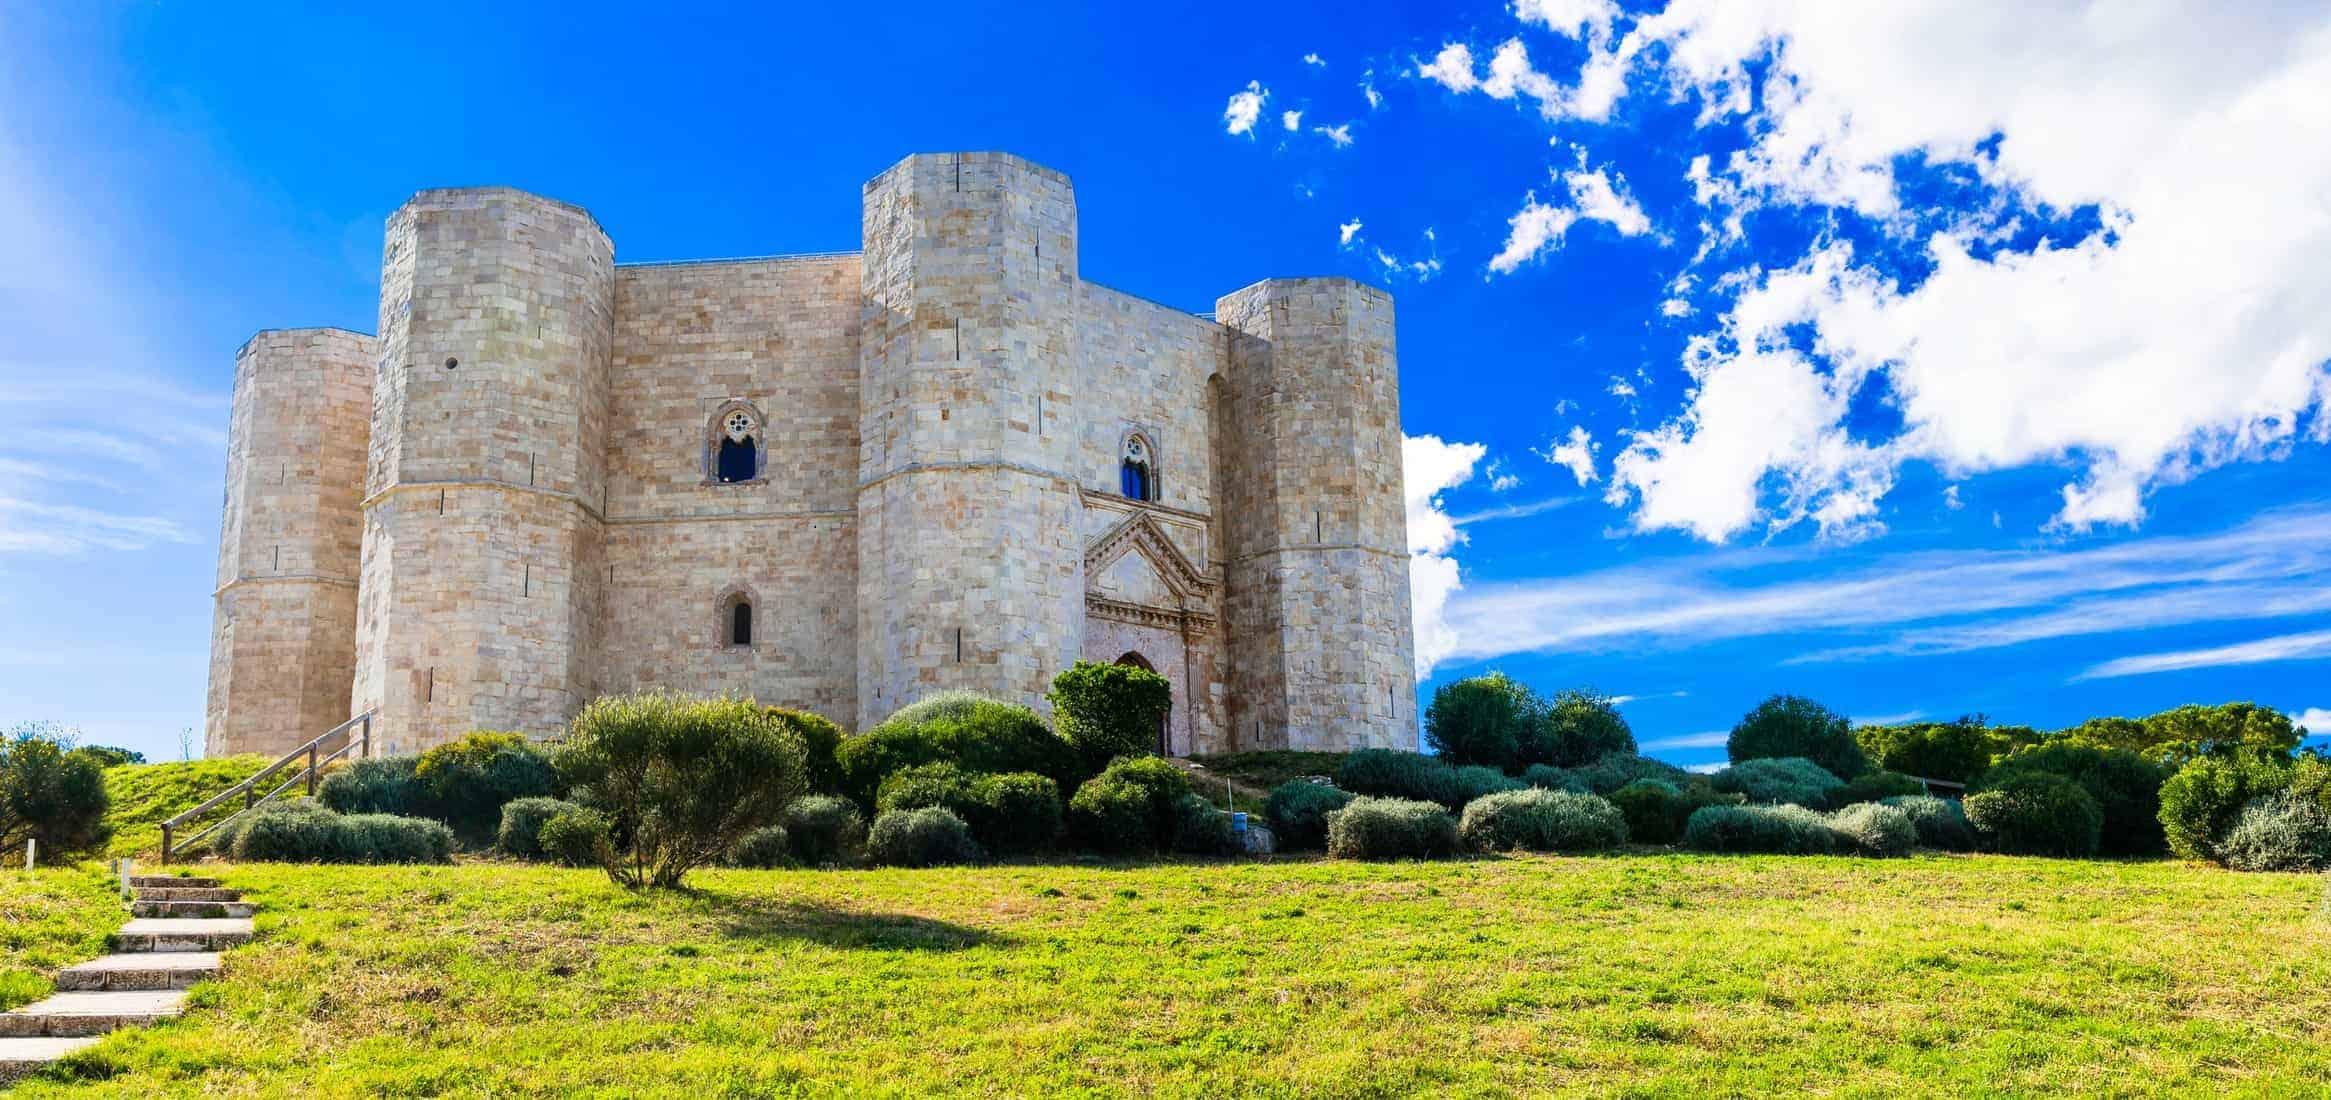 Unique octagonal castle Castel del Monte, Puglia, Italy.